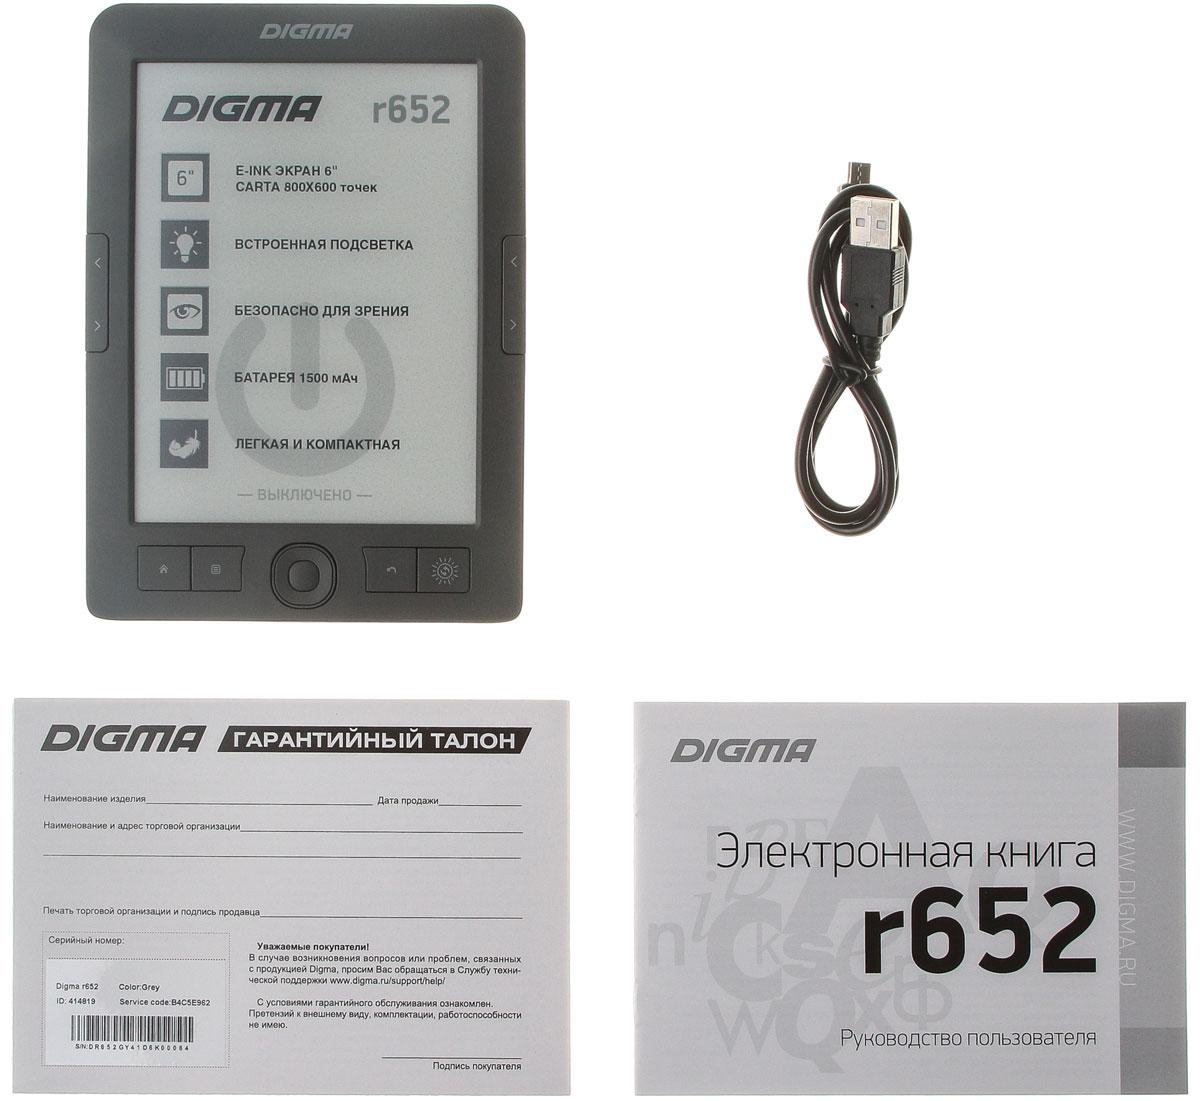 Digma R652, Grayэлектронная книга Digma